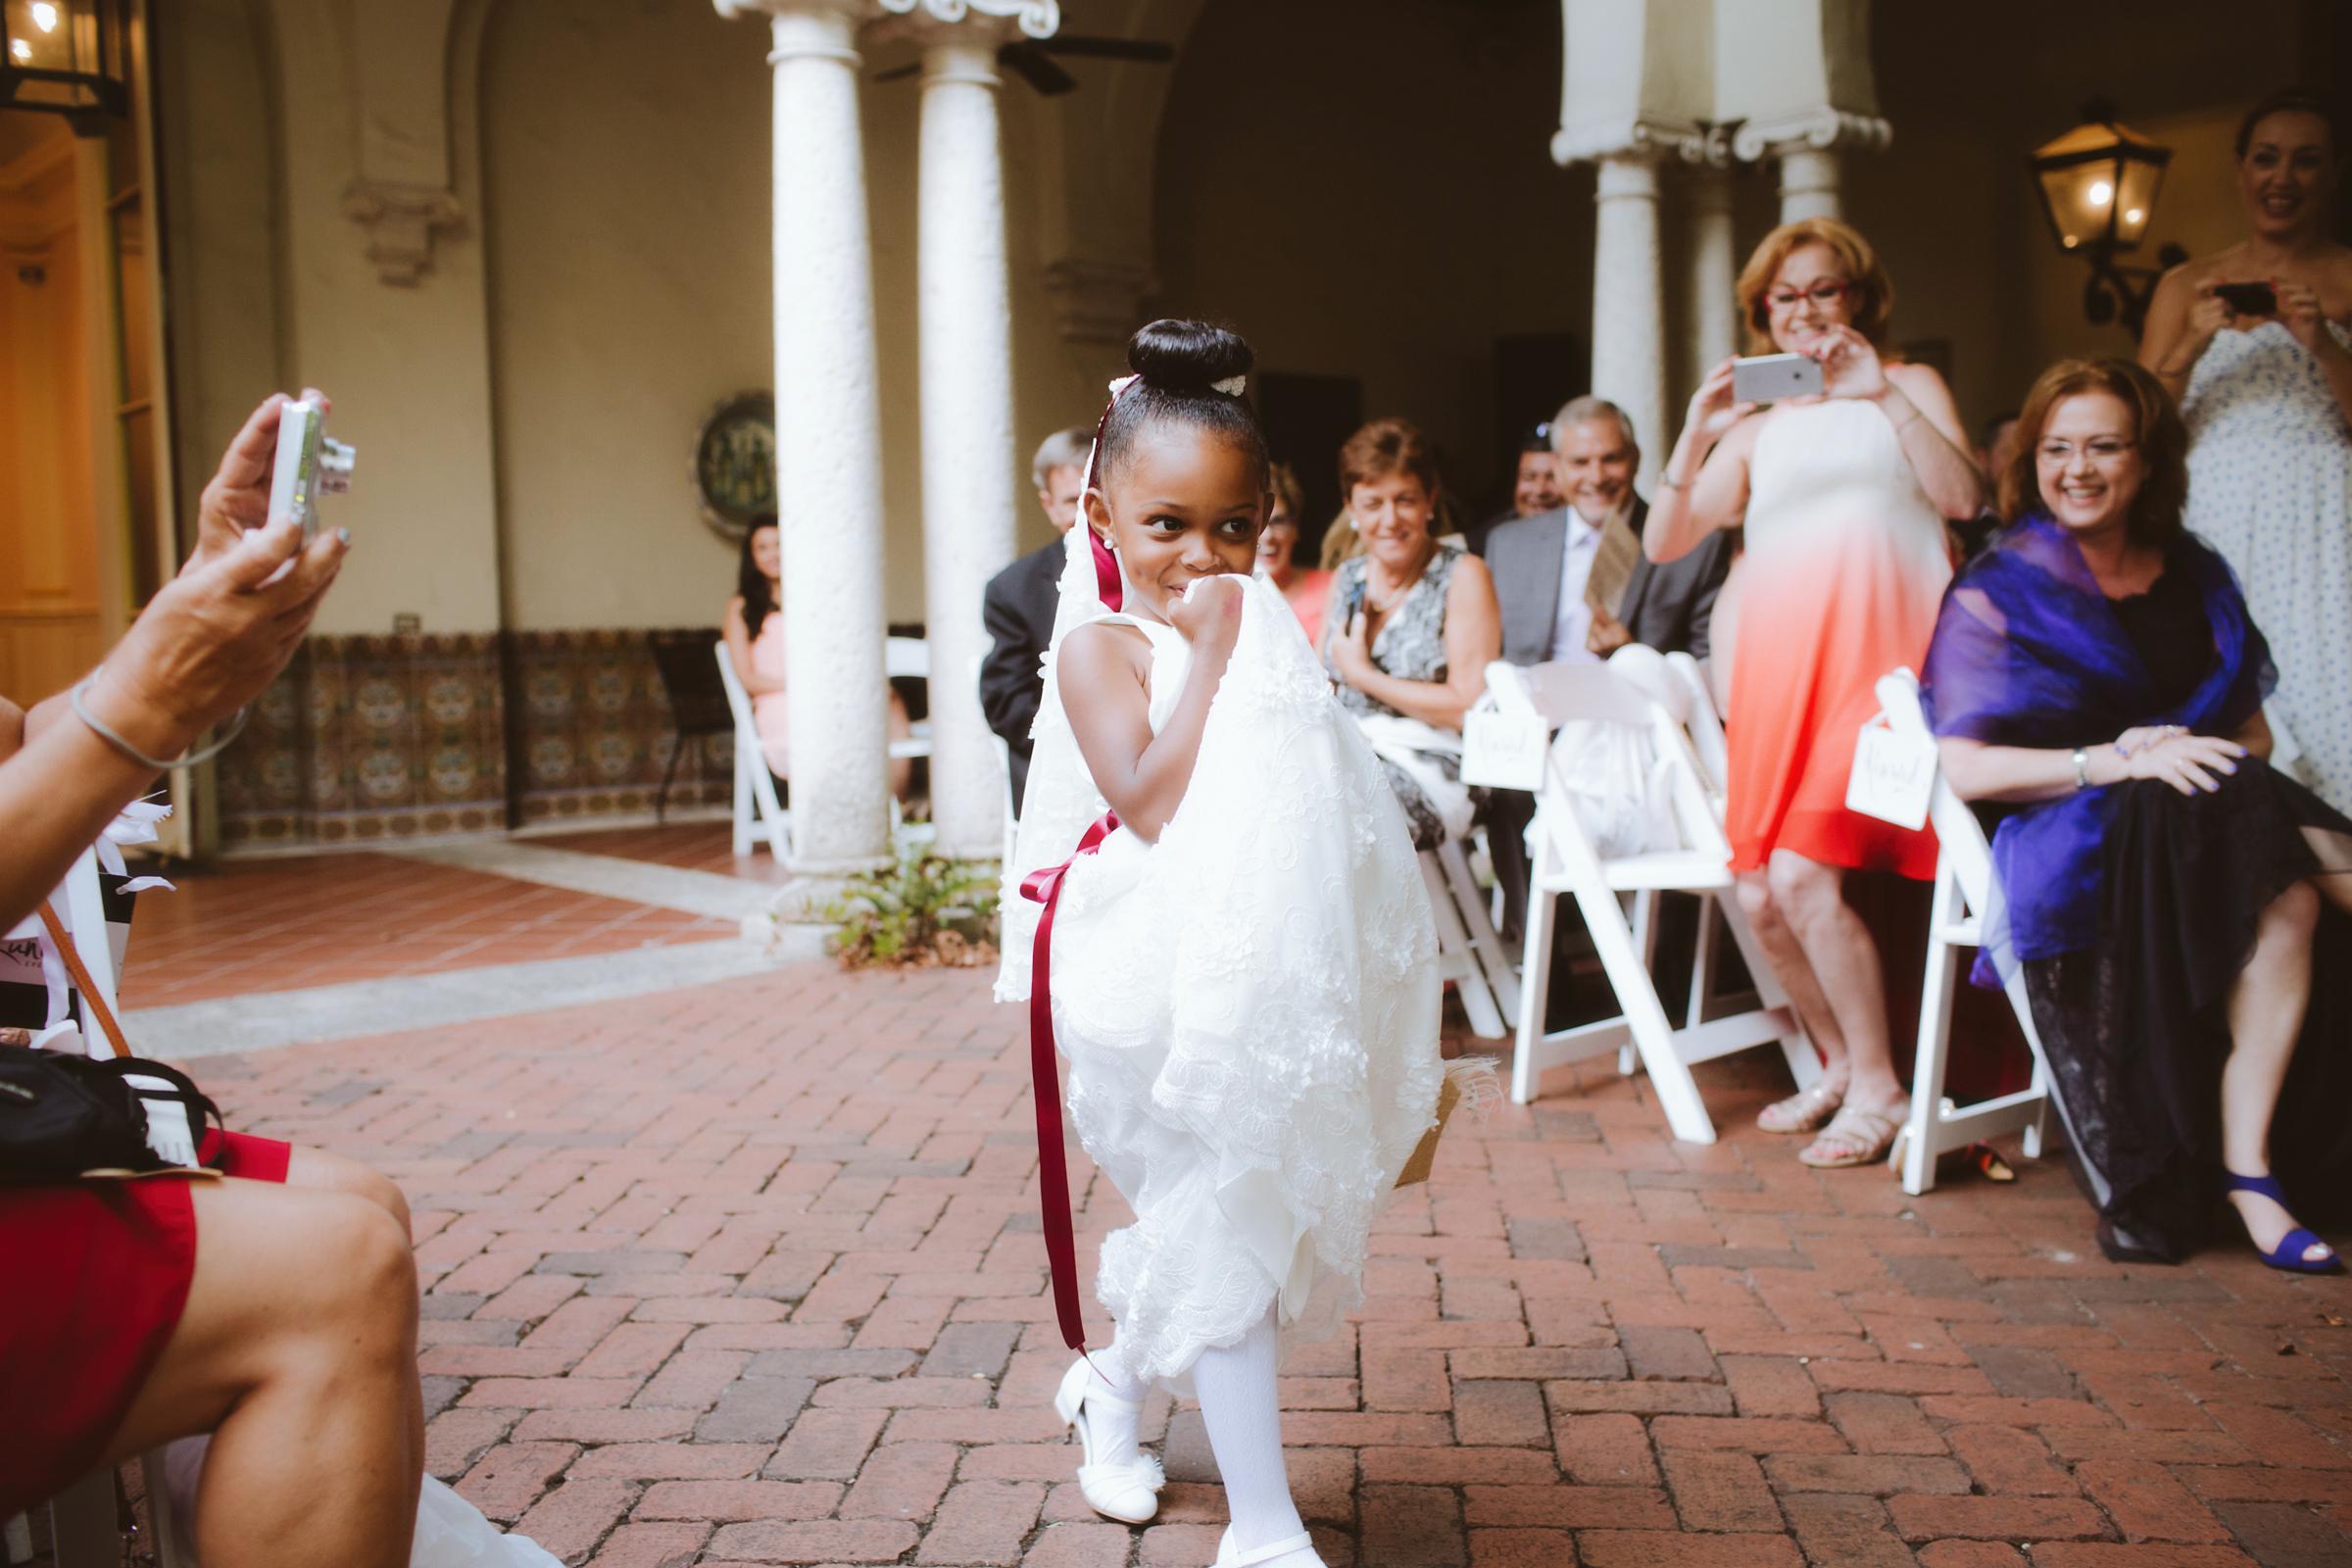 wedding day | MFA St Pete | Vanessa Boy Photography | vanessaboy.com-320.com |final.jpg